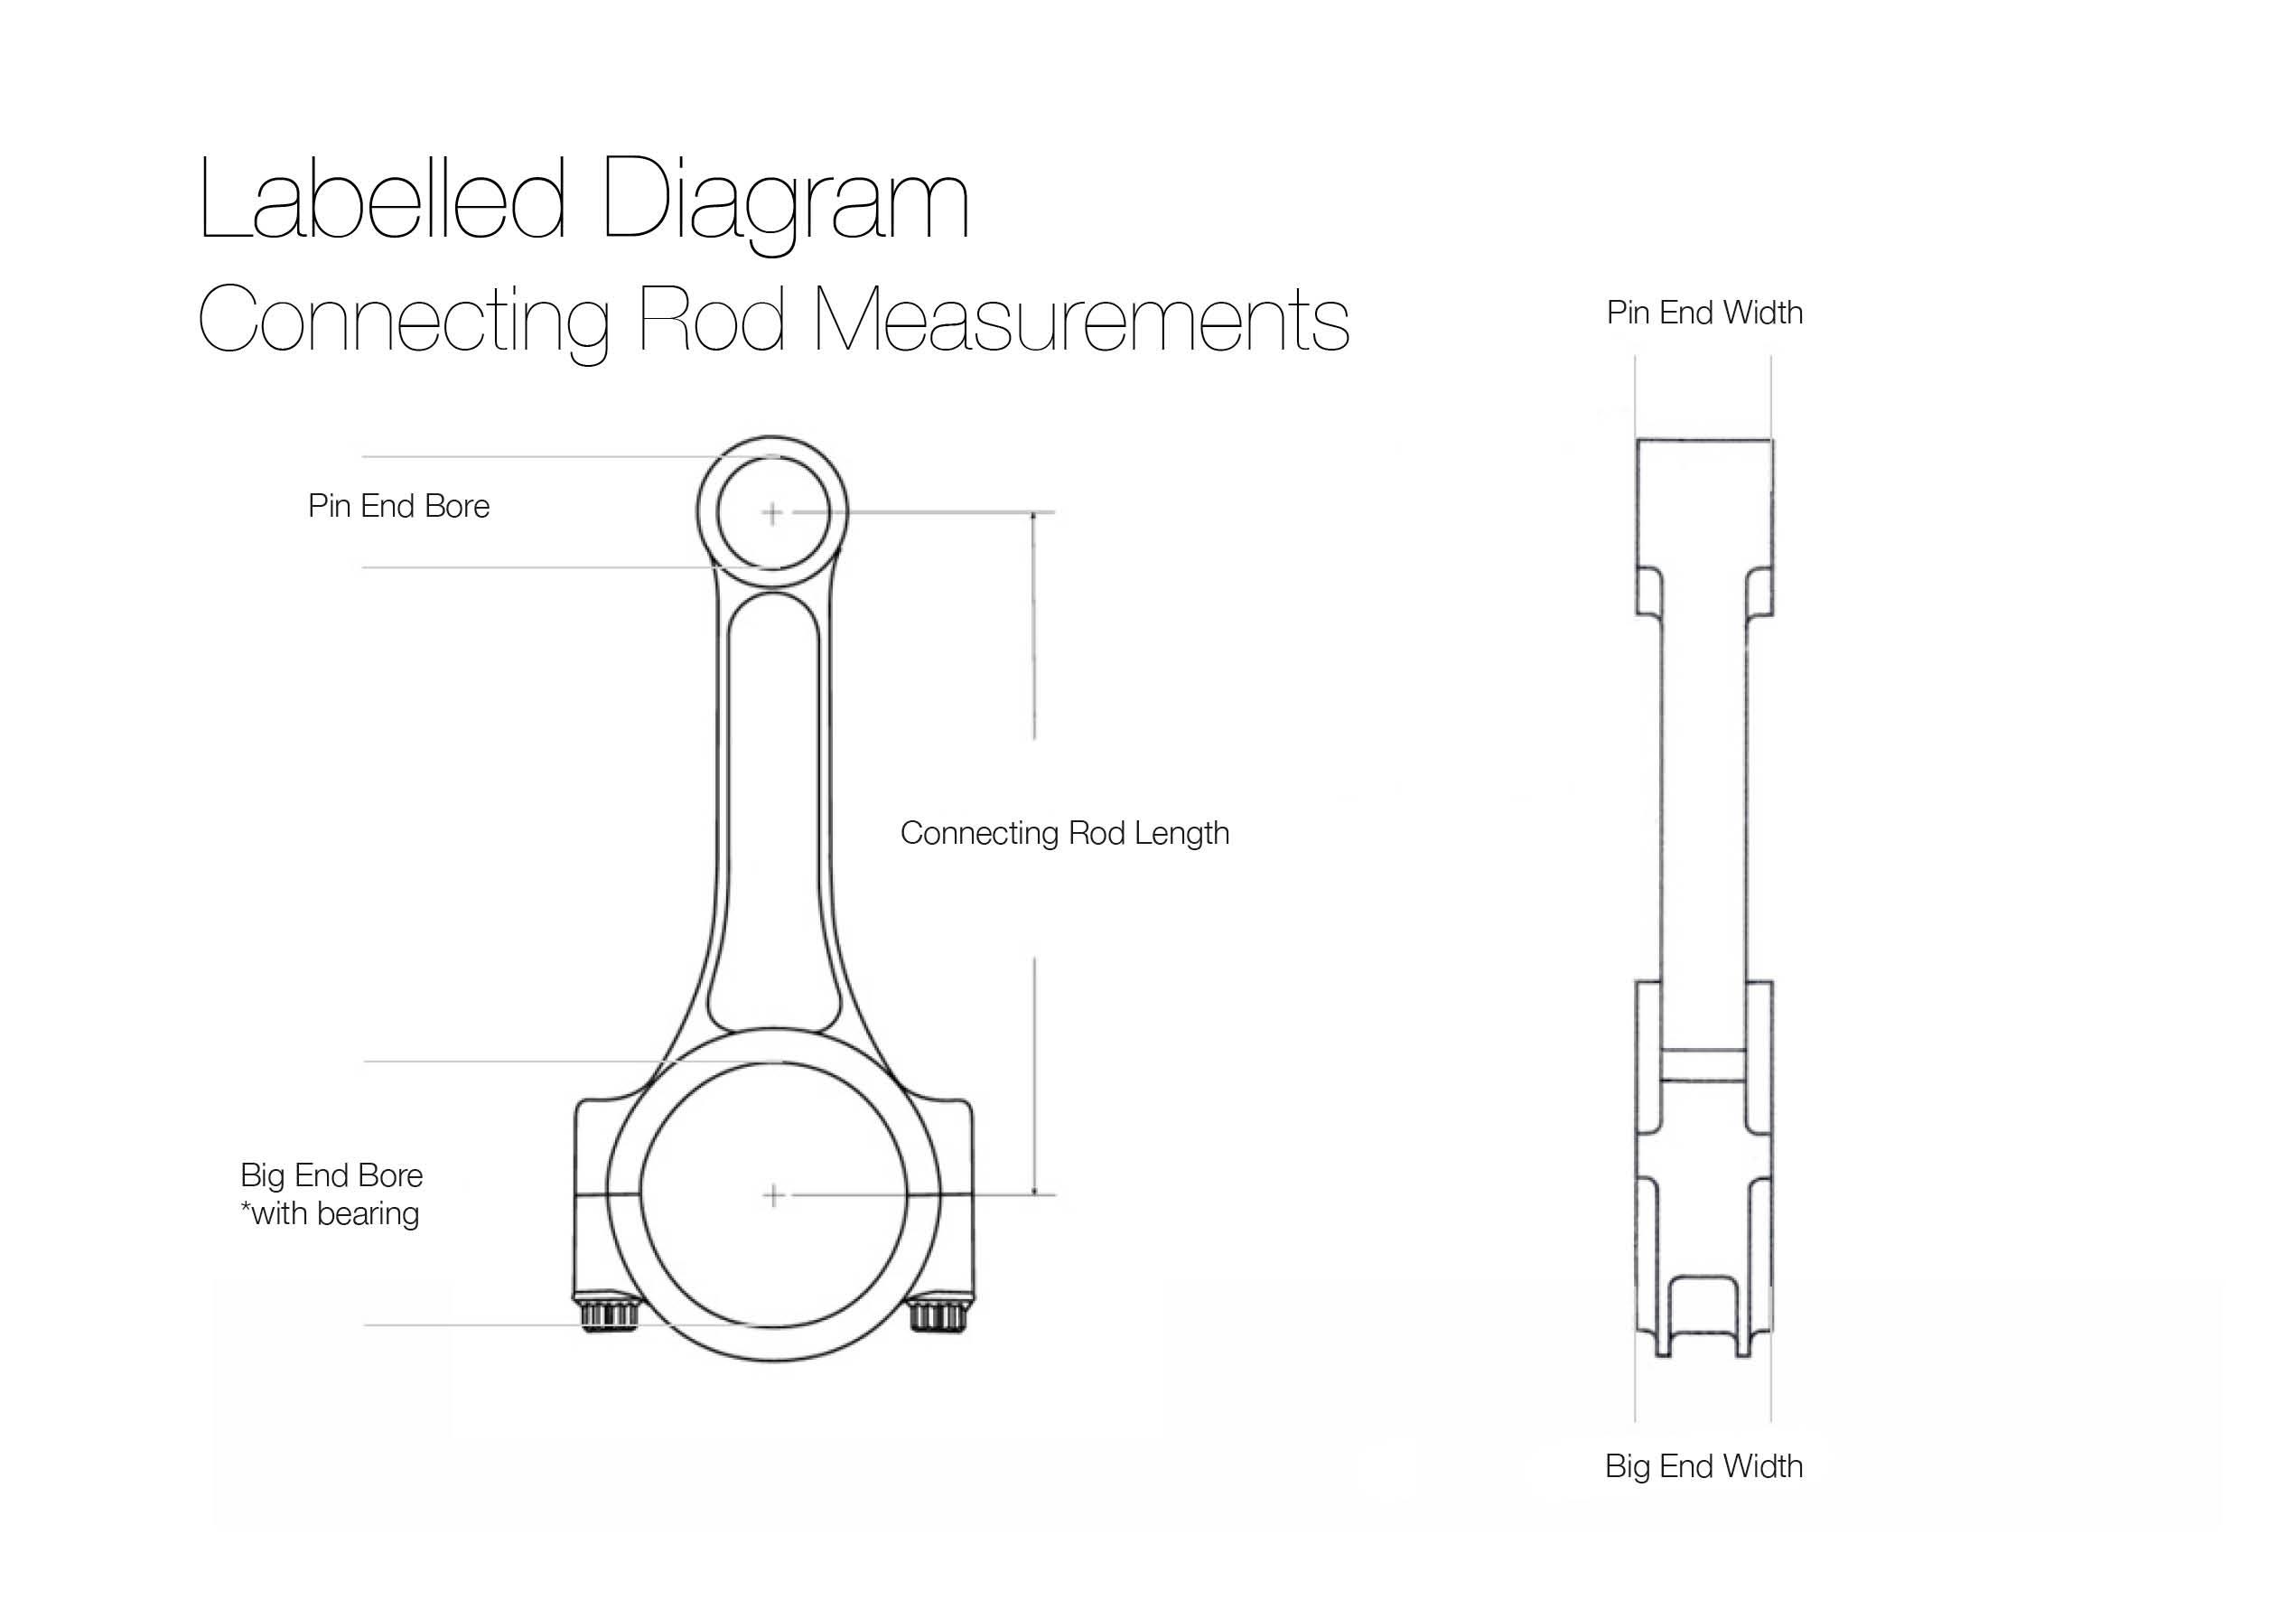 H Beam 6100 2100 927 4340 Connecting Rods Chevy Sbc 350 W Arp Engine Diagram Piston Brand Speedmaster